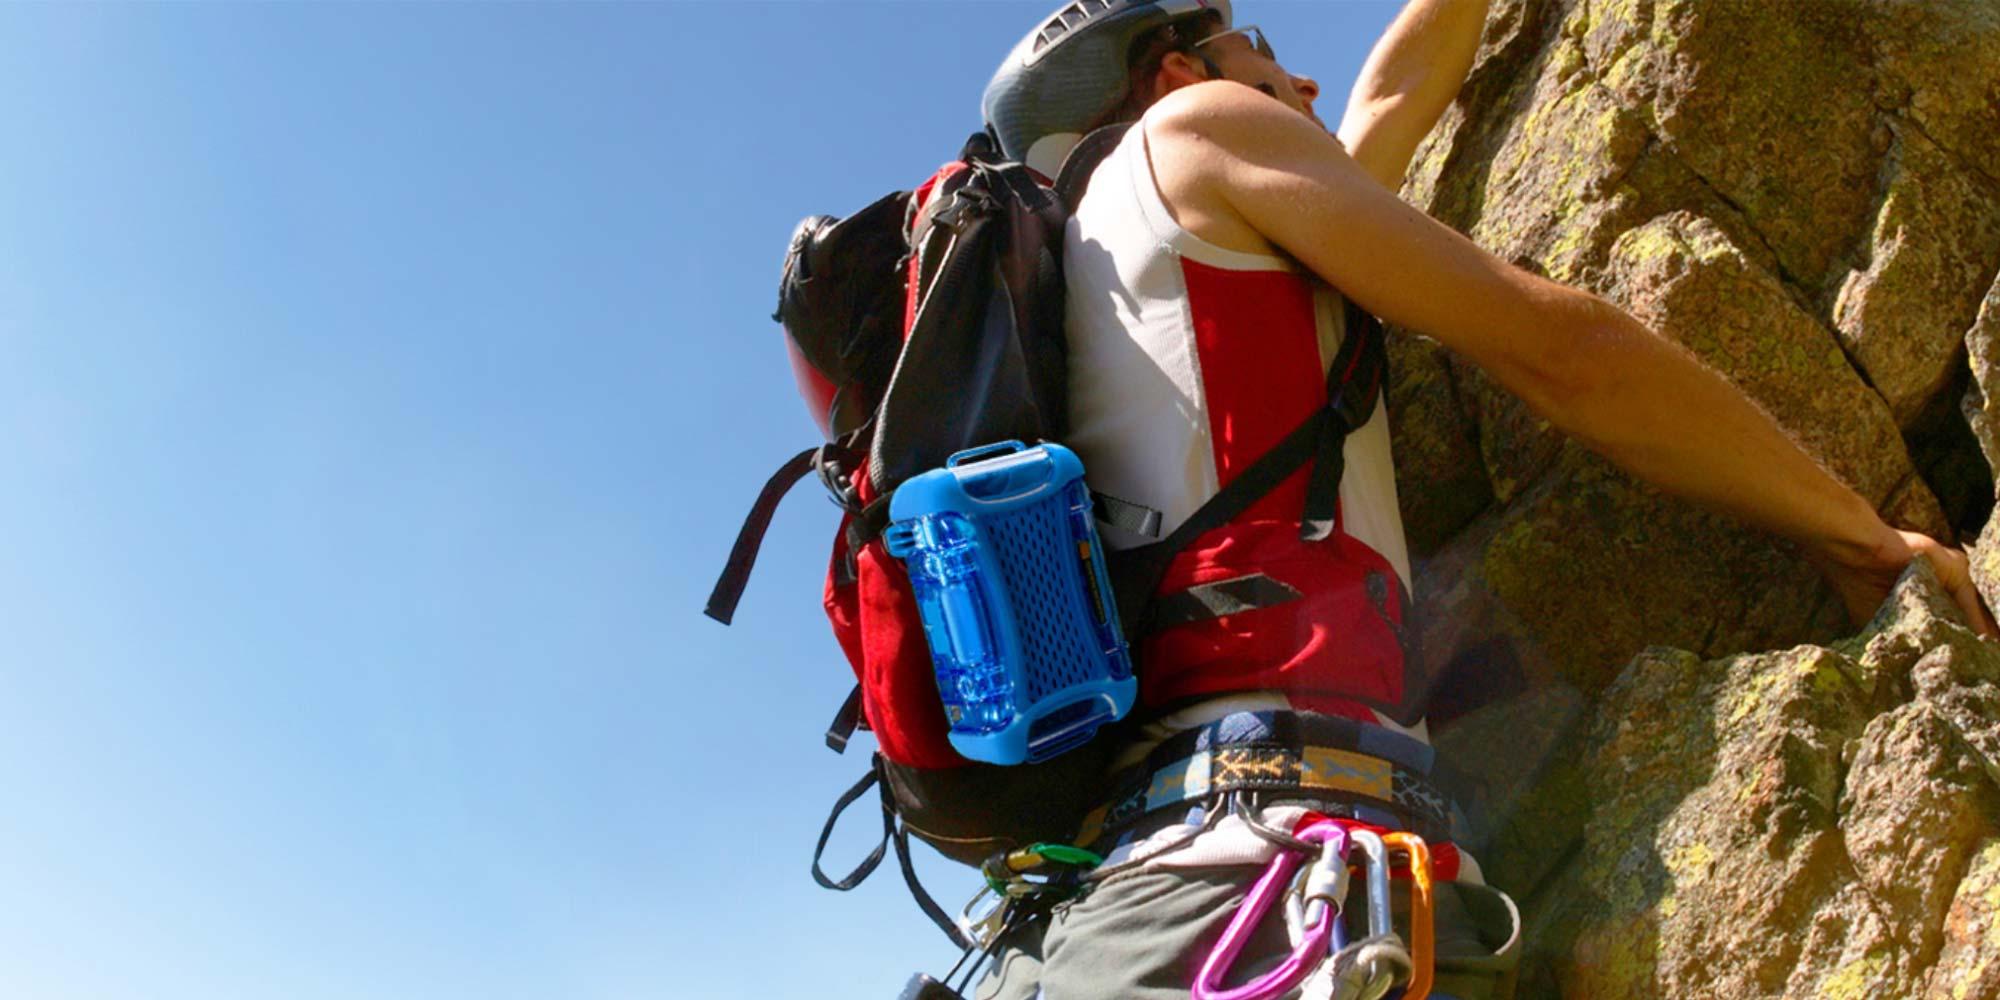 330-mountain-climber.jpg